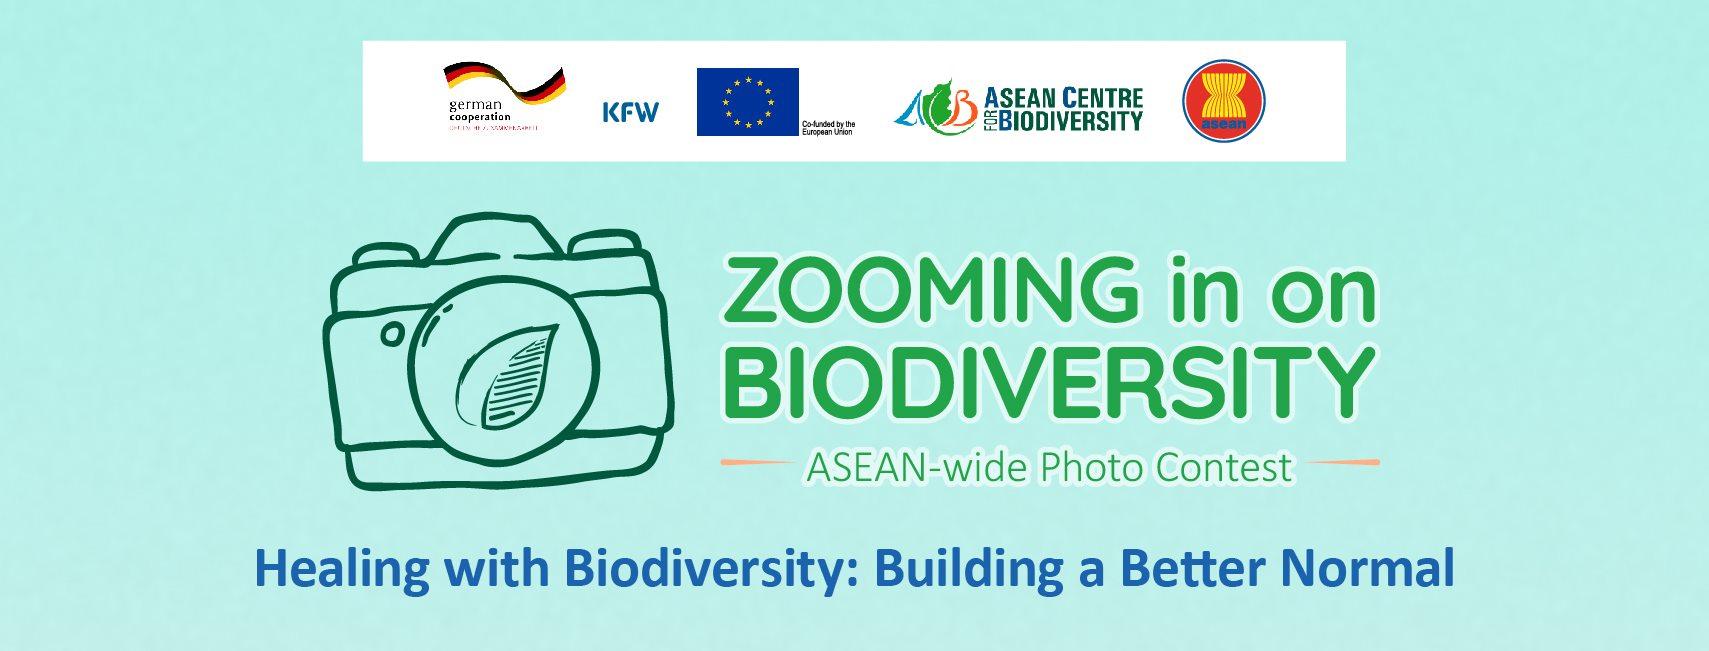 Zooming in on Biodiversity 2020 - logo